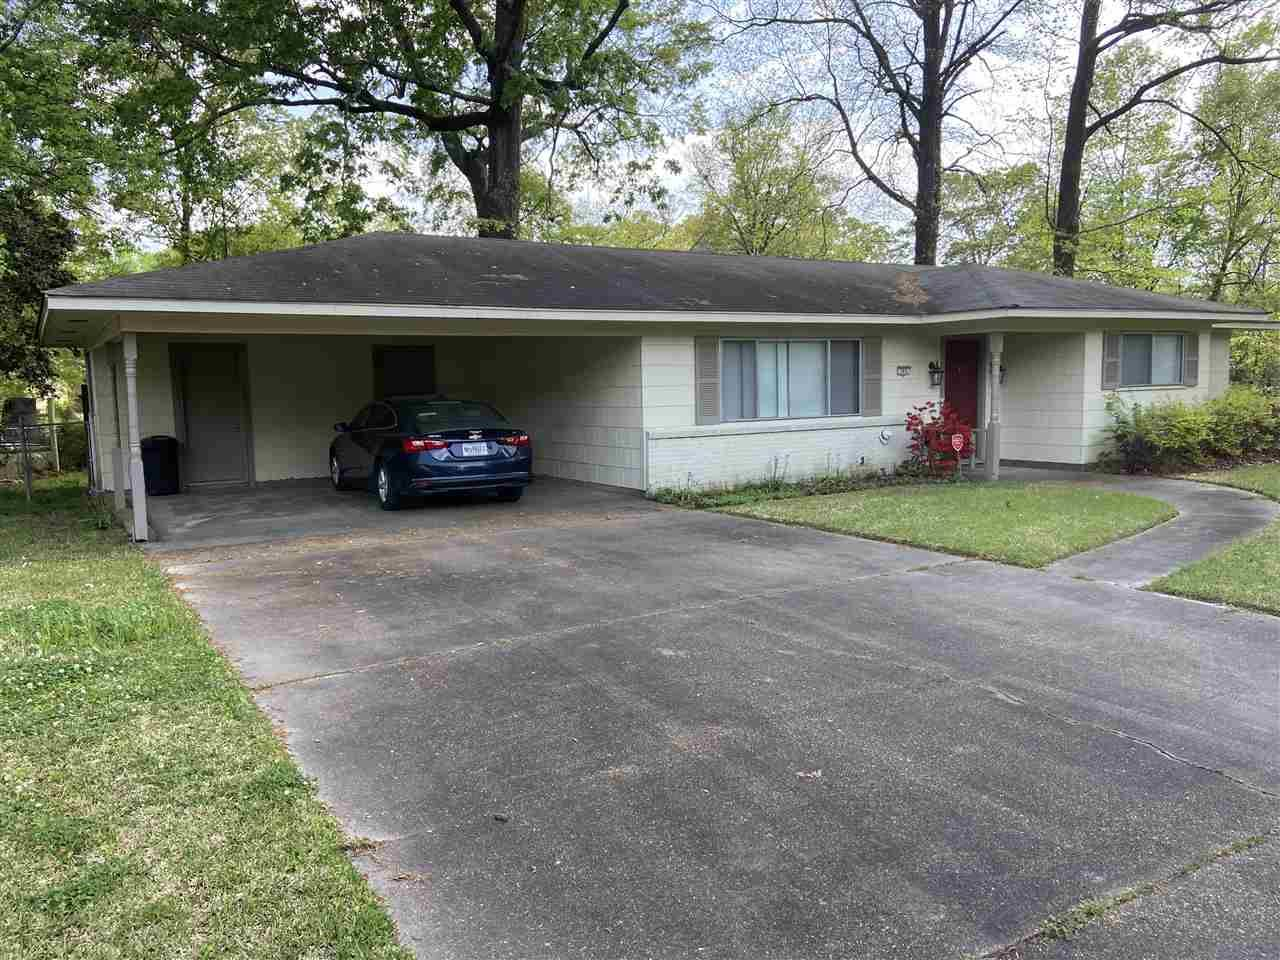 305 FRANCIS ST, Jackson, MS 39206 - MLS#: 339944